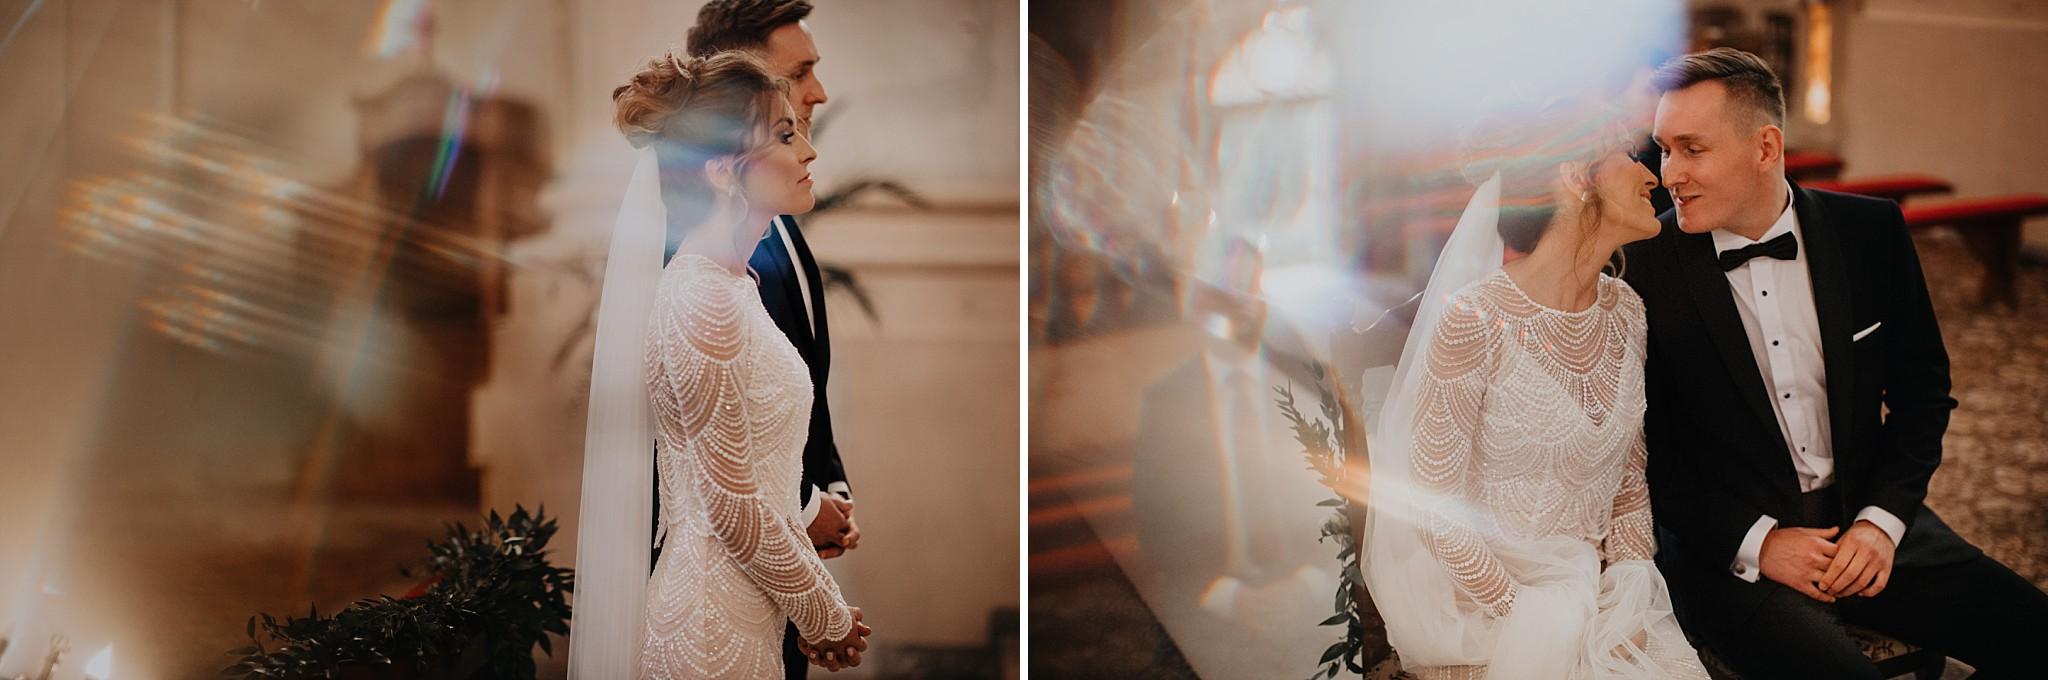 fotograf poznan wesele dobra truskawka piekne wesele pod poznaniem wesele w dobrej truskawce piekna para mloda slub marzen slub koronawirus slub listopad wesele koronawirus 168